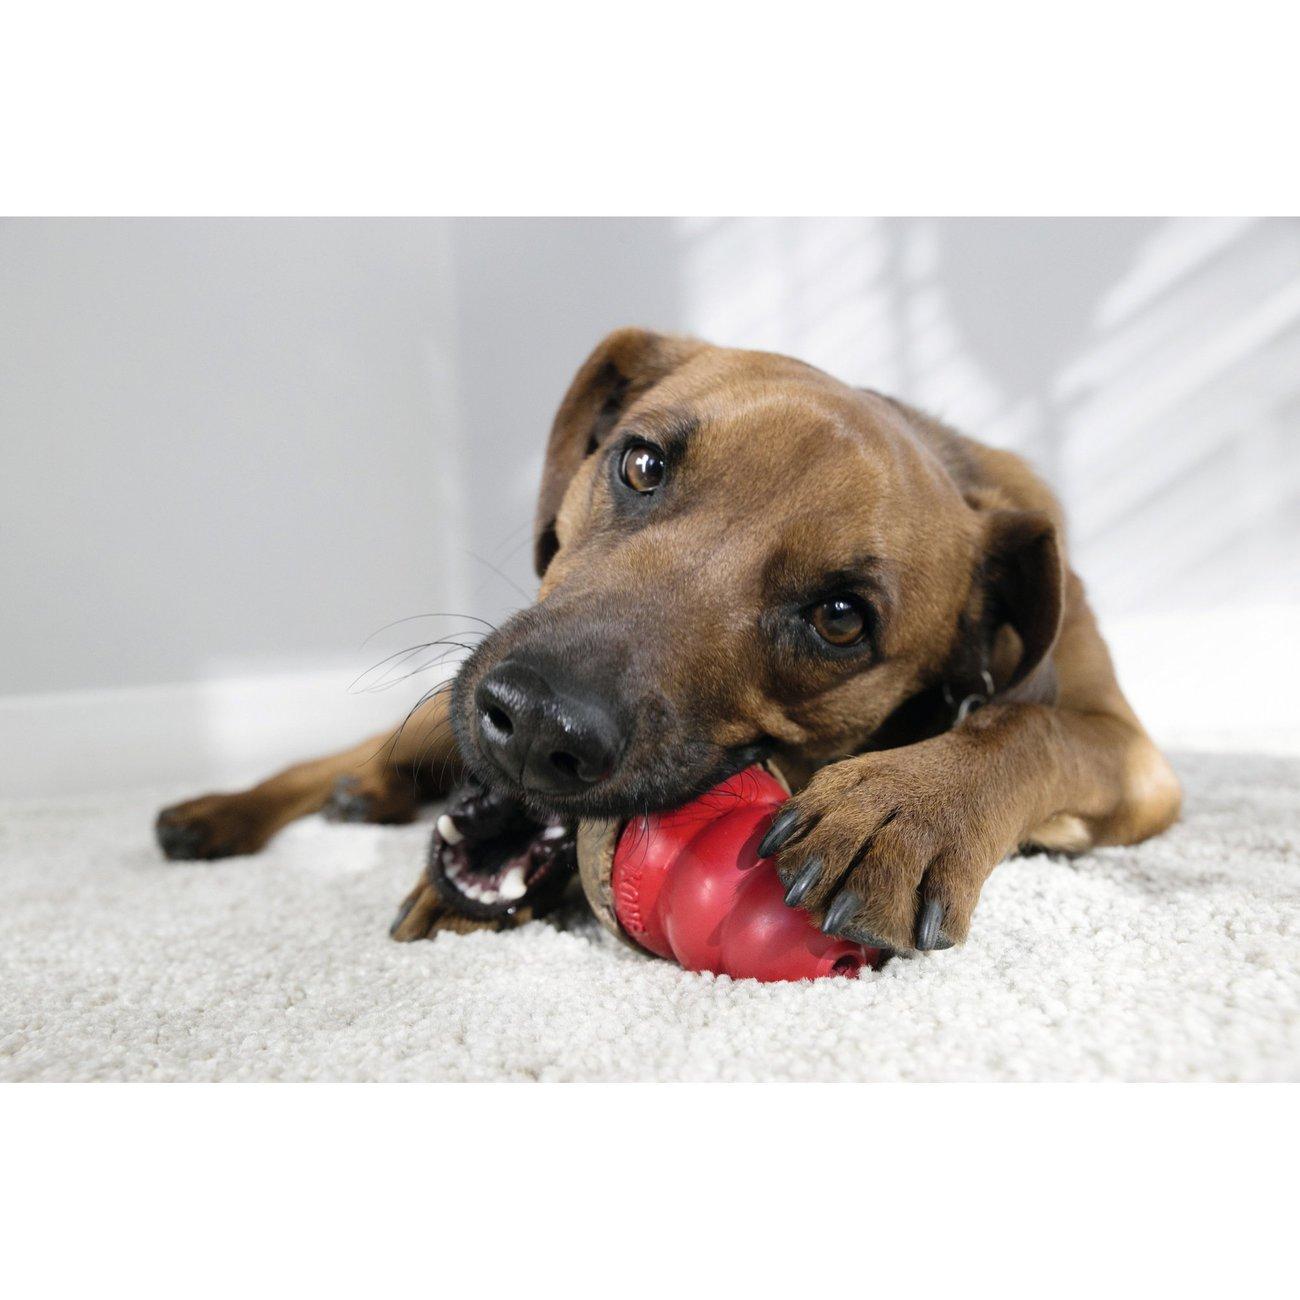 KONG Marathon Hundesnack, Bild 2